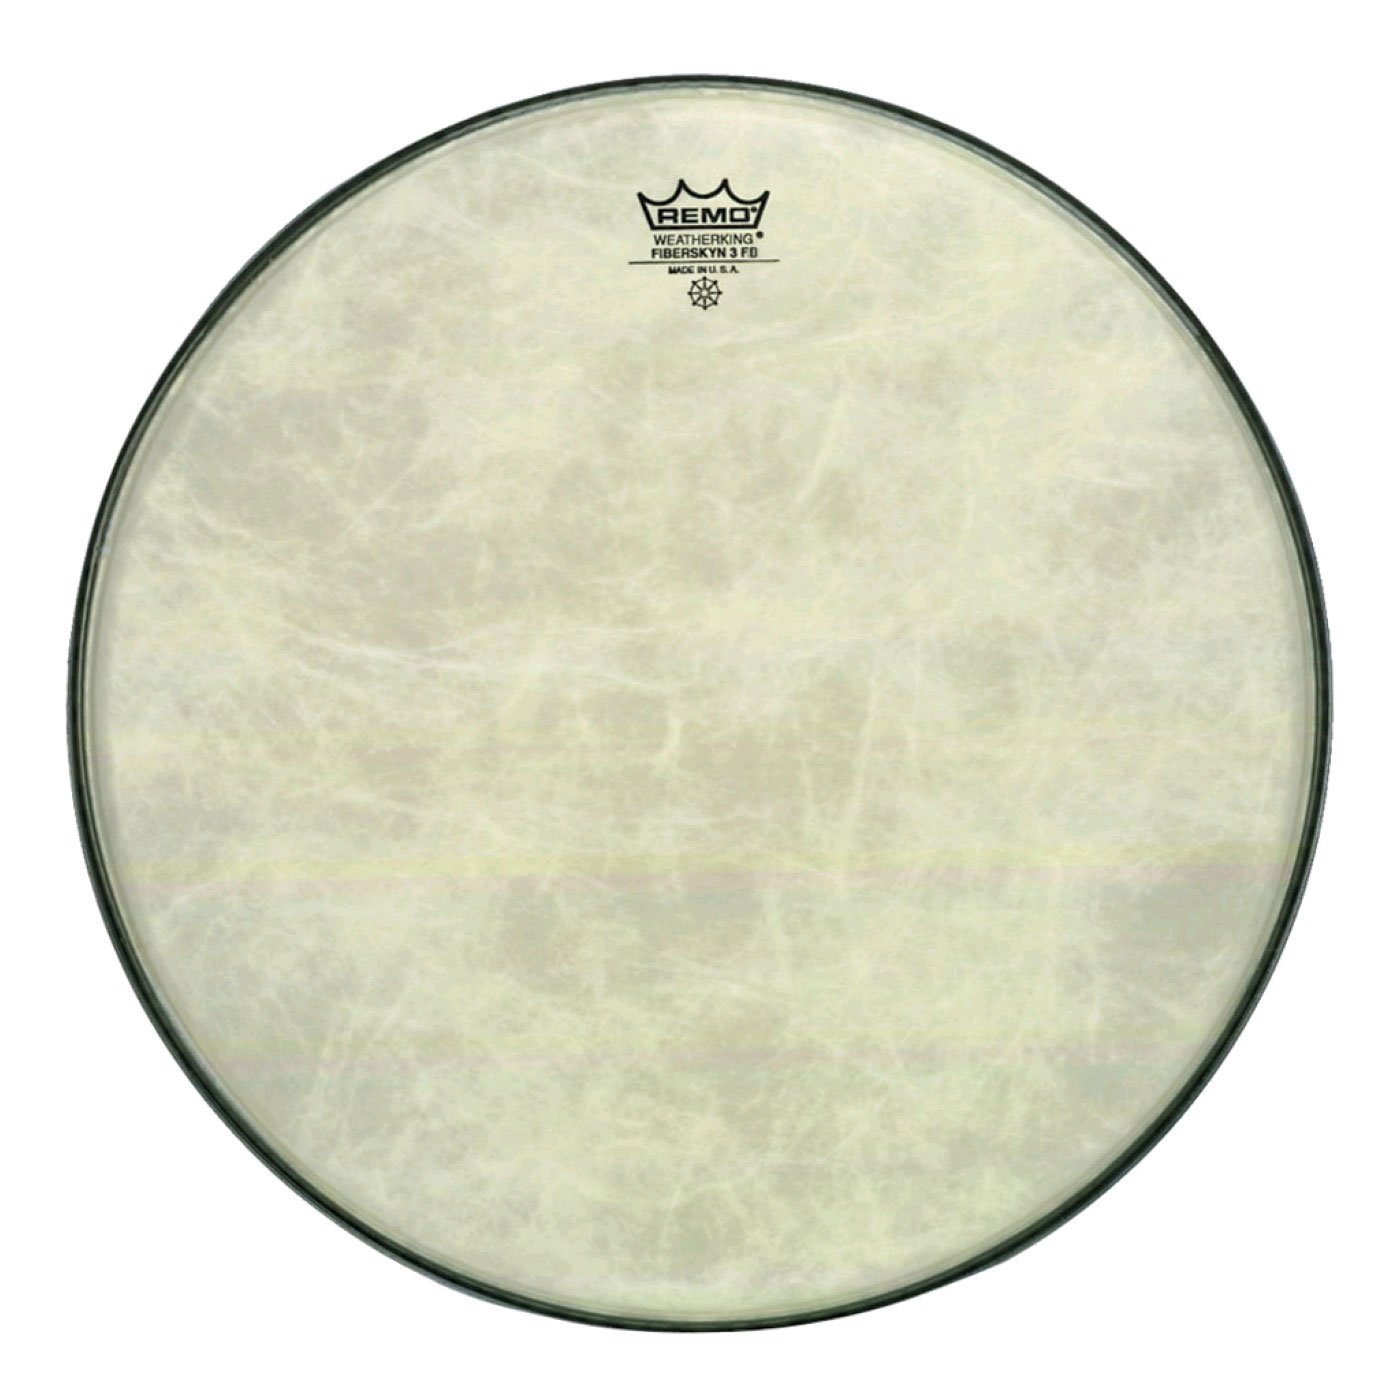 Remo FD1520-00 20-Inch Fiberskyn Diplomat Bass Drum Head